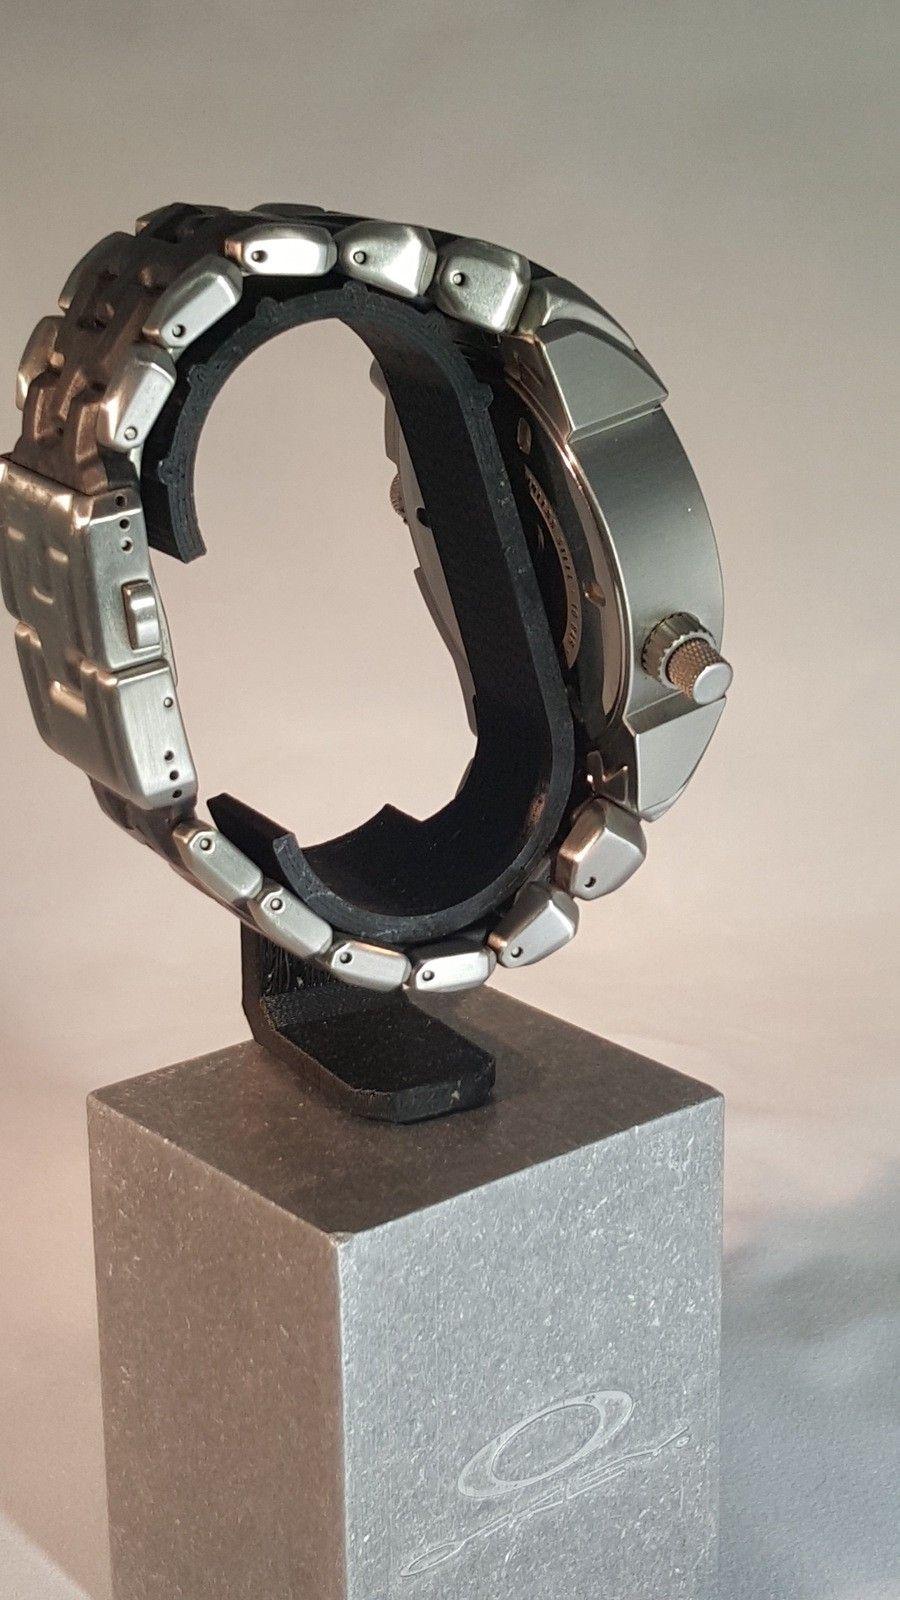 Great Damn Condition - 12 Guage Watch - 500. + Watch Valut - 20151203_132847.jpg.jpeg